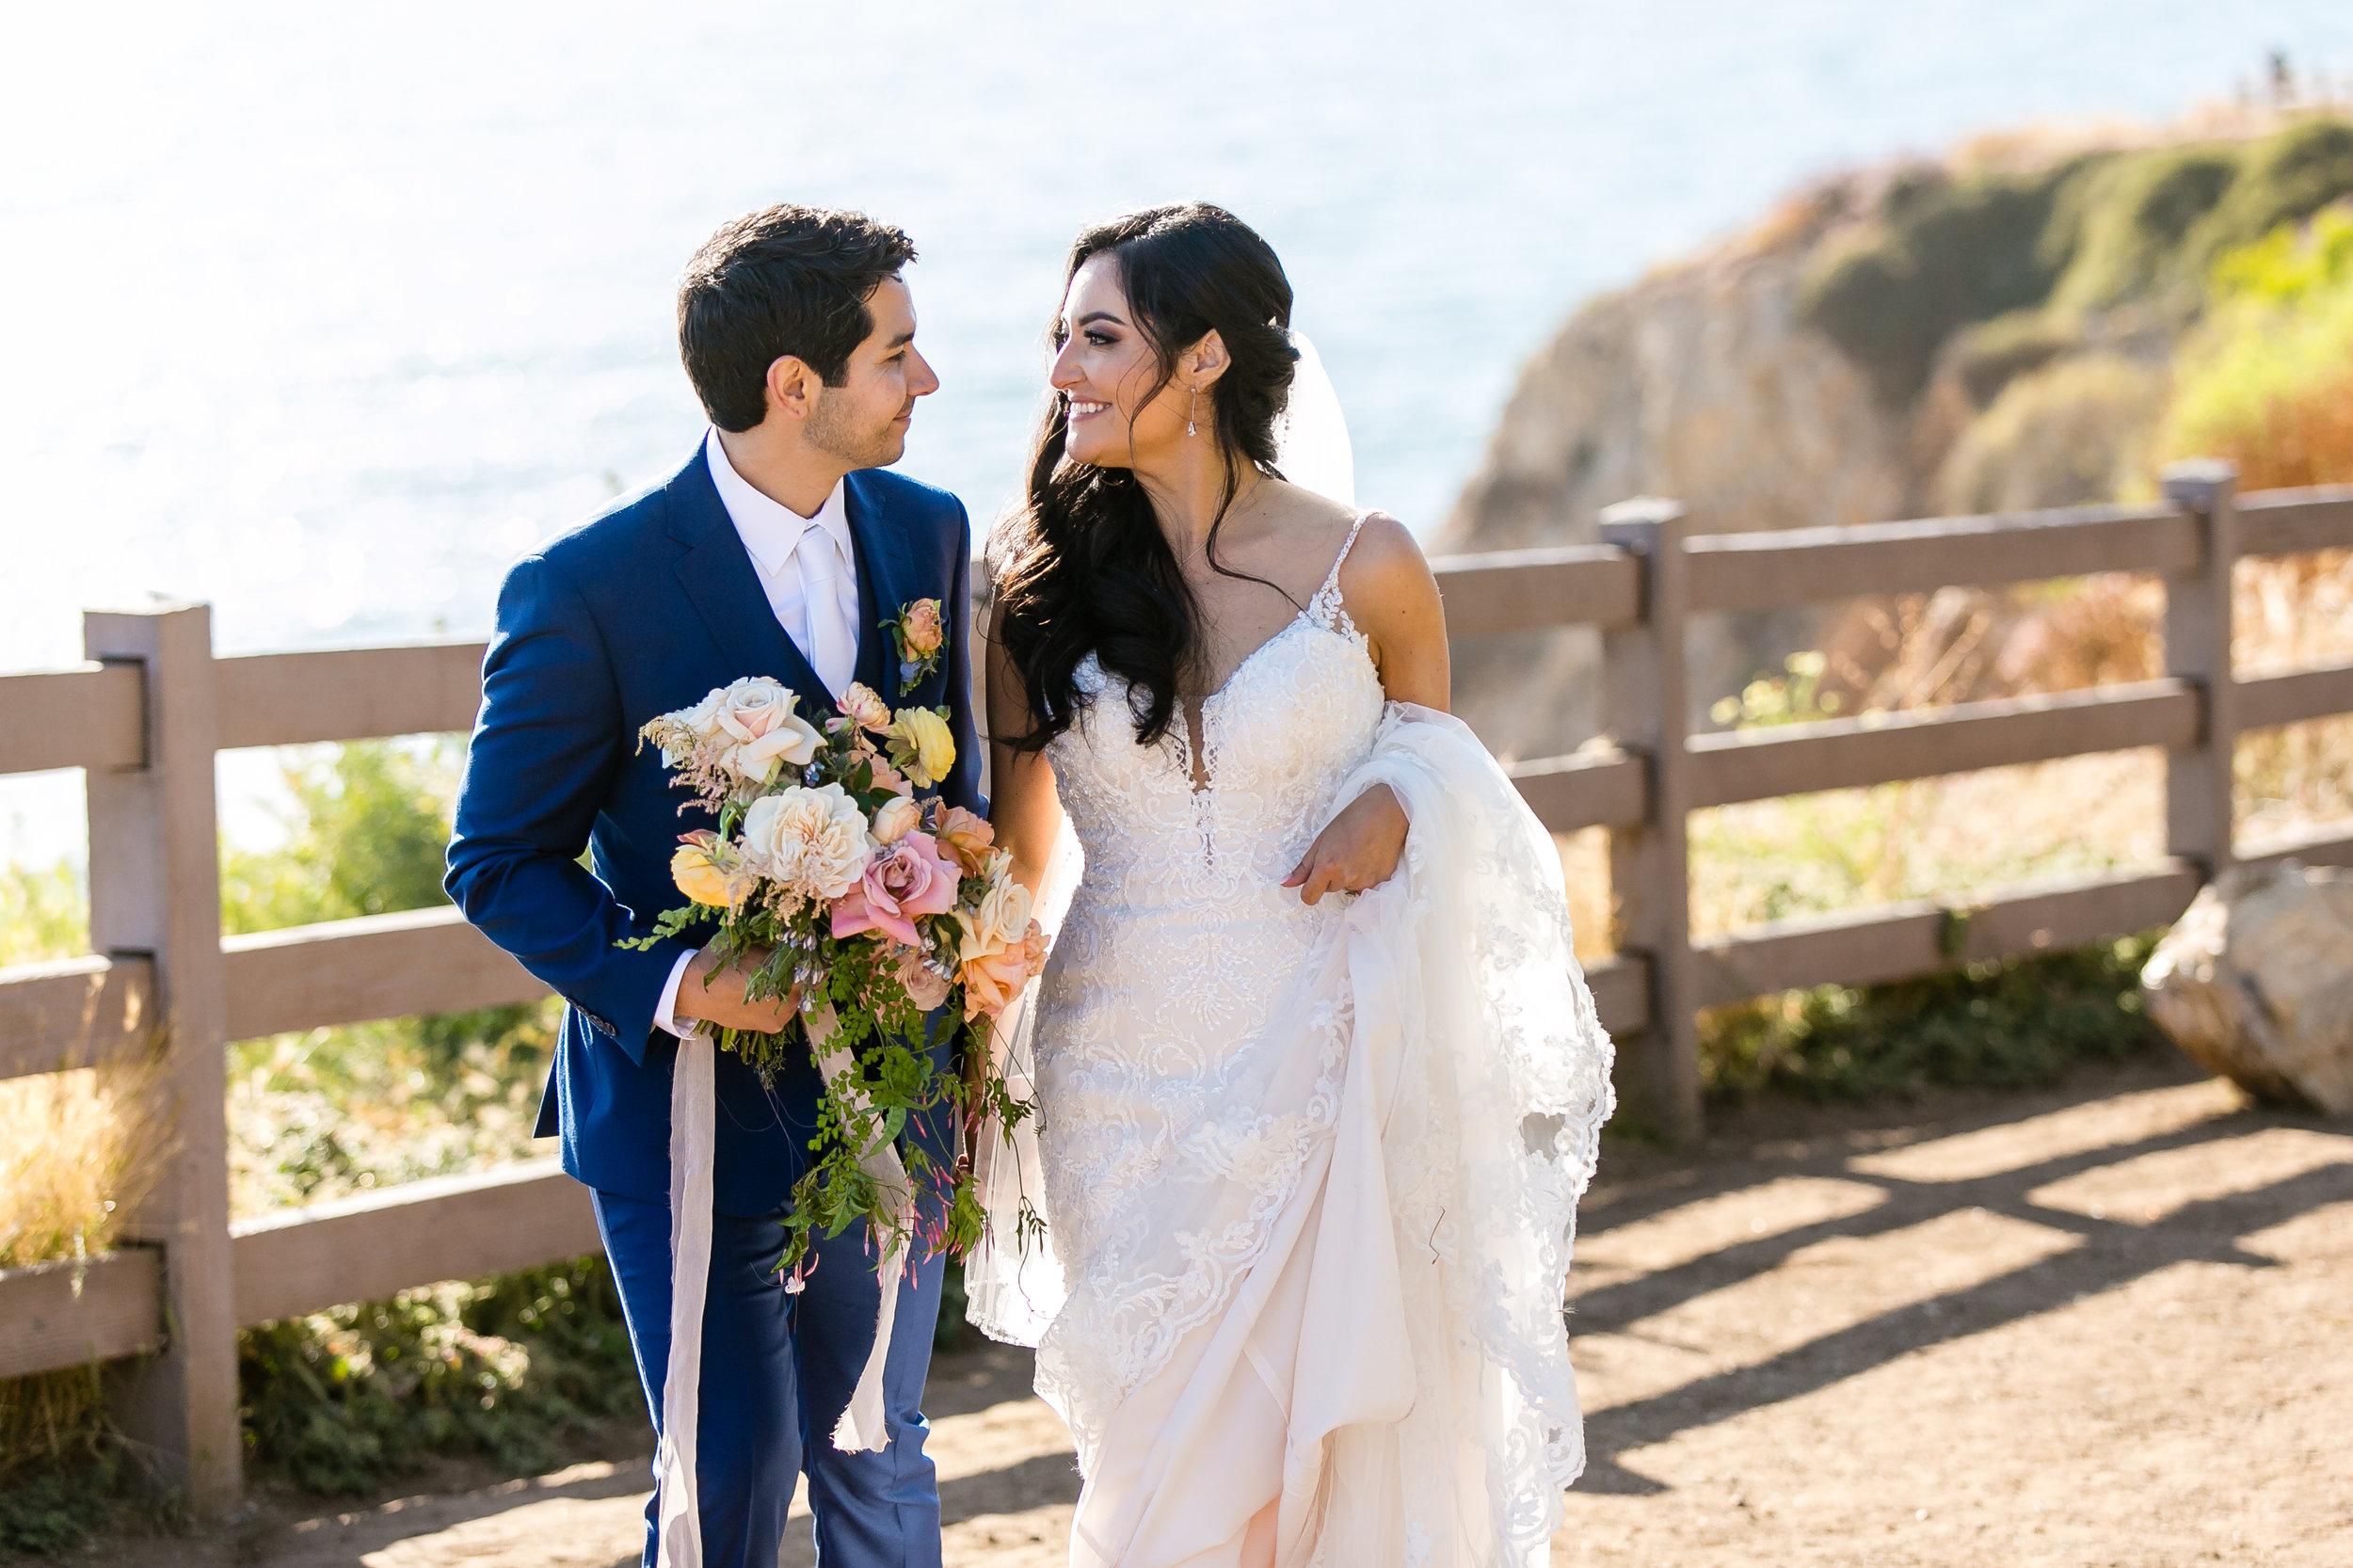 2019_05_24_Wedding_Barajas_0770.jpg